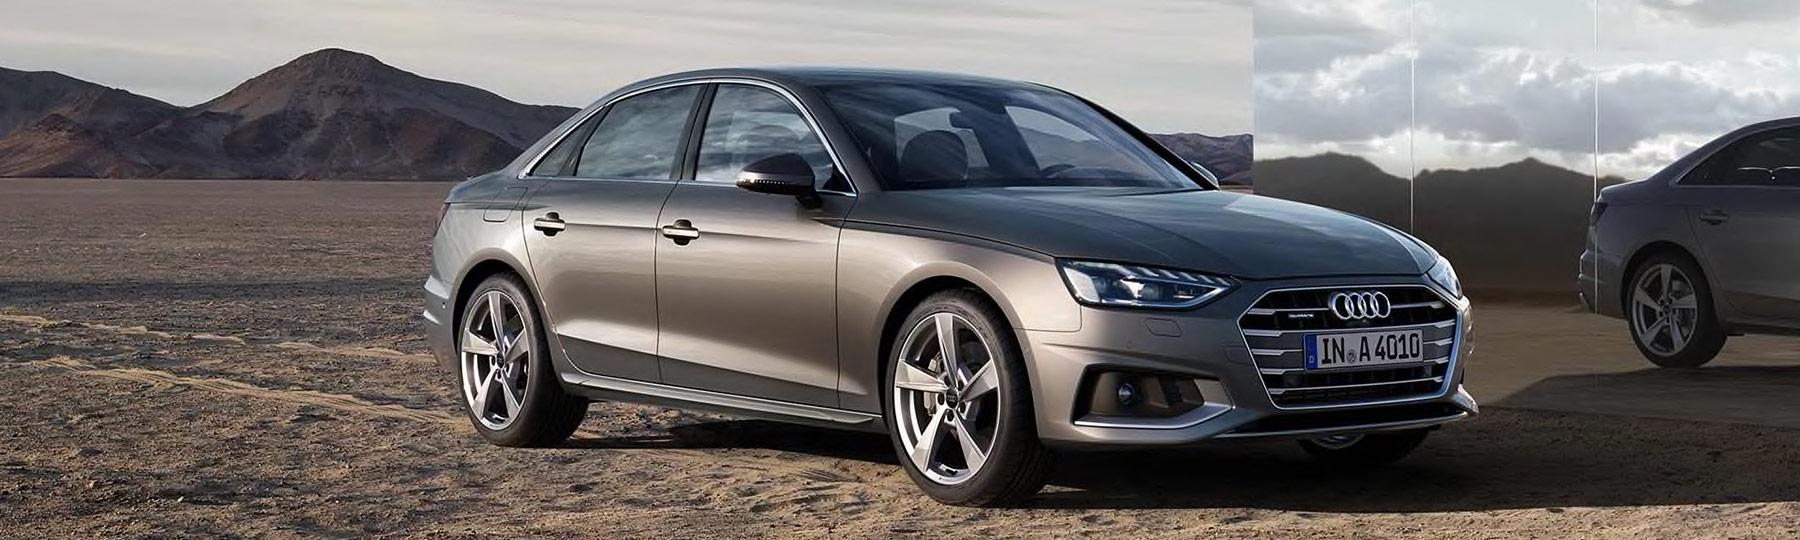 Audi A4 Saloon New Car Offer